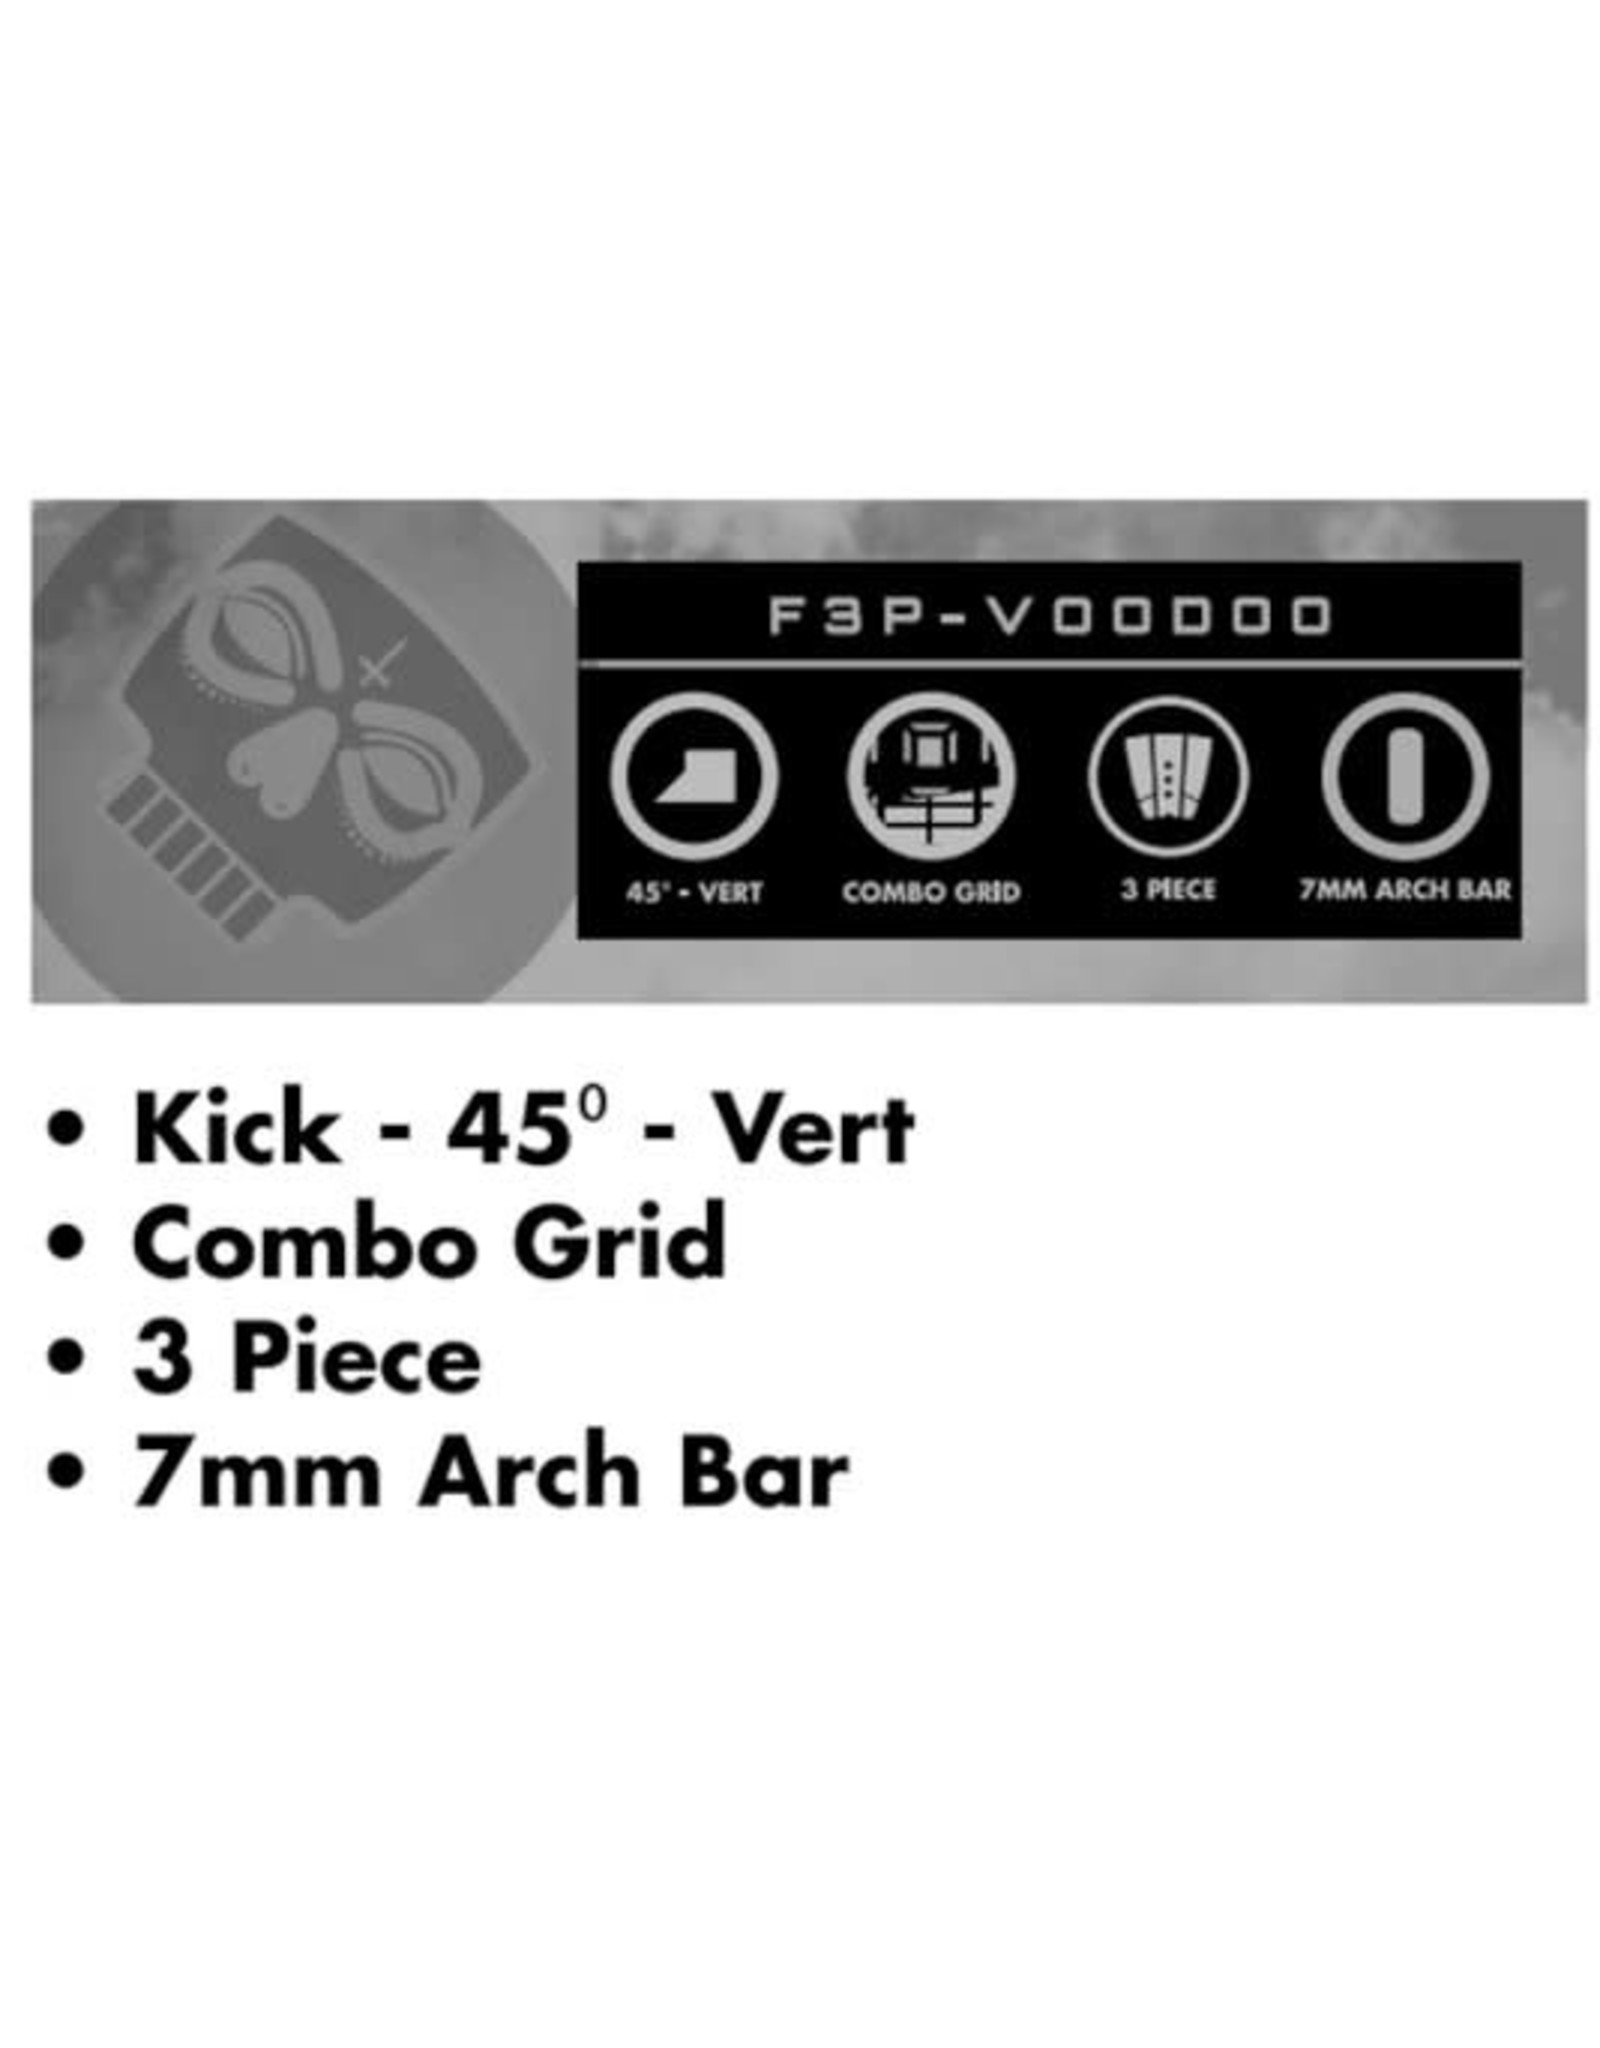 Futures FUTURES Traction Pad Surfboard Footpad 3pc Voodoo